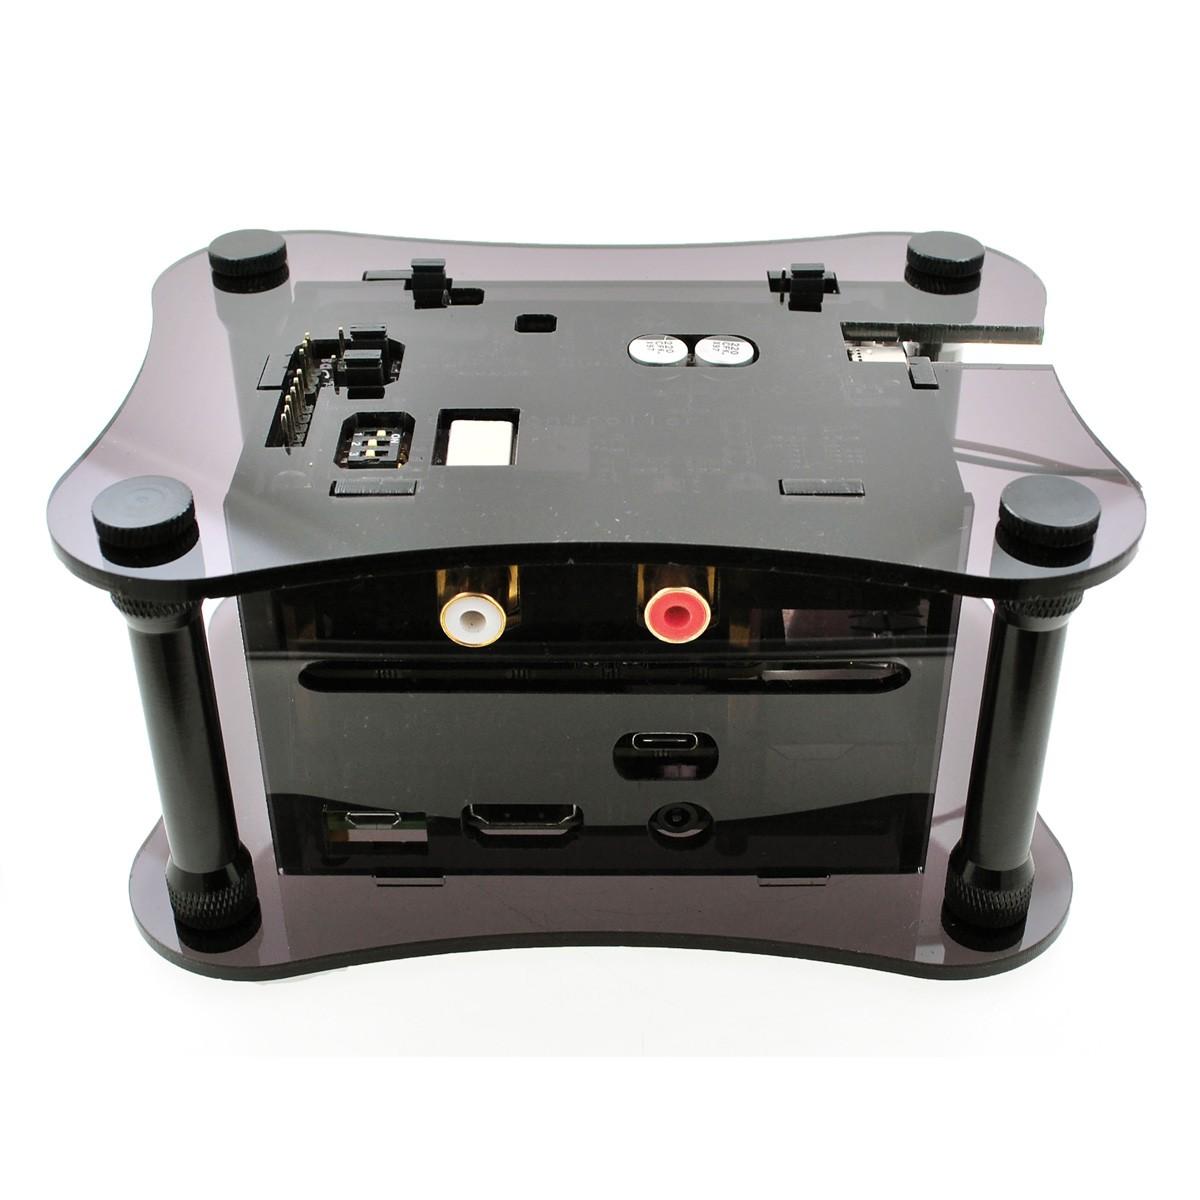 ALLO Acrylic Case for Allo Katana + Allo Isolator V1.2 + Raspberry Pi 3 Black